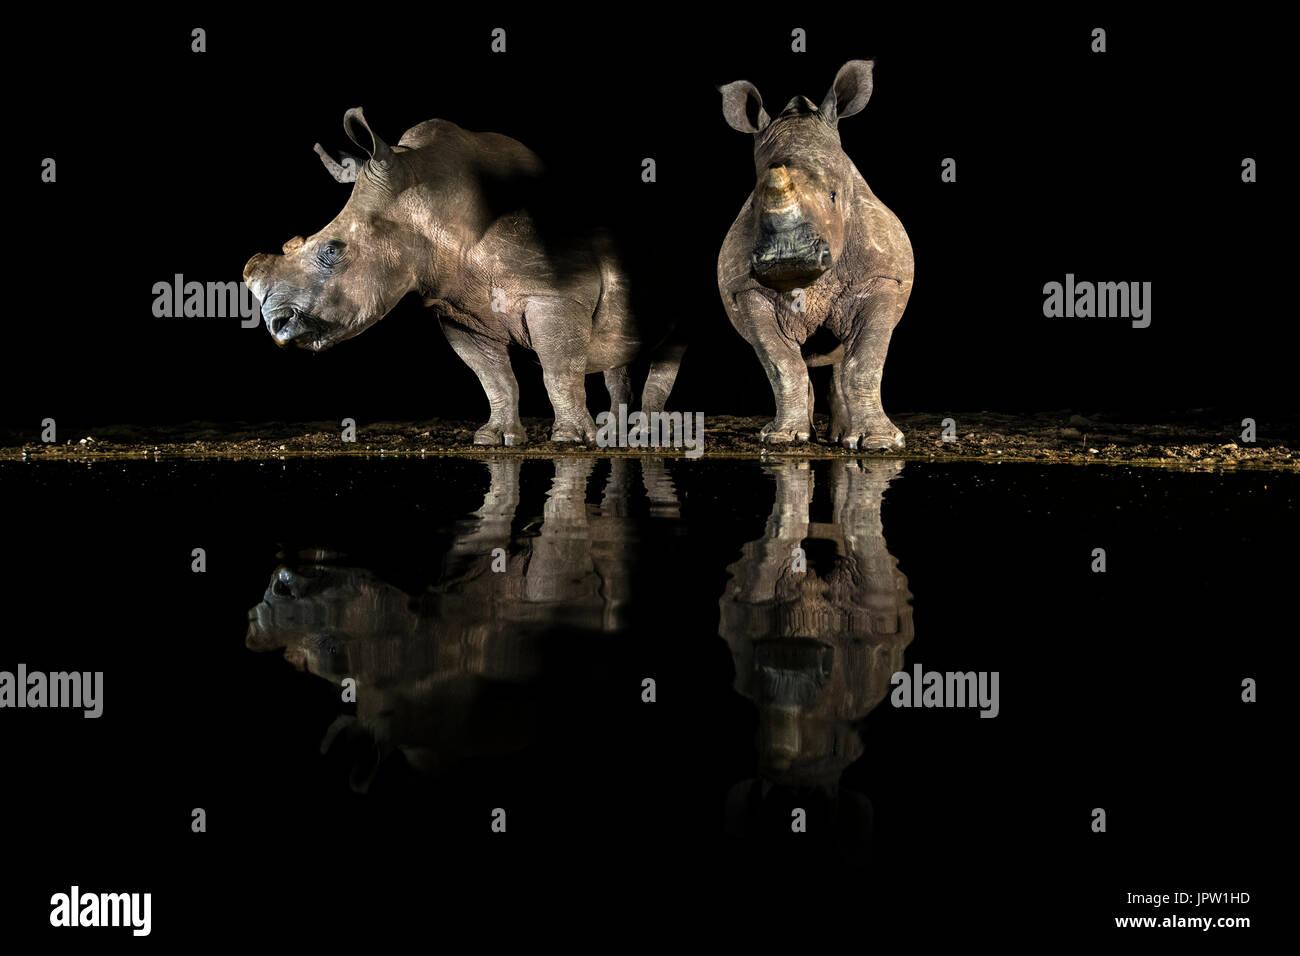 White Rhino (Ceratotherium simum) bere di notte, KwaZulu-Natal, Sud Africa, maggio 2017 Immagini Stock